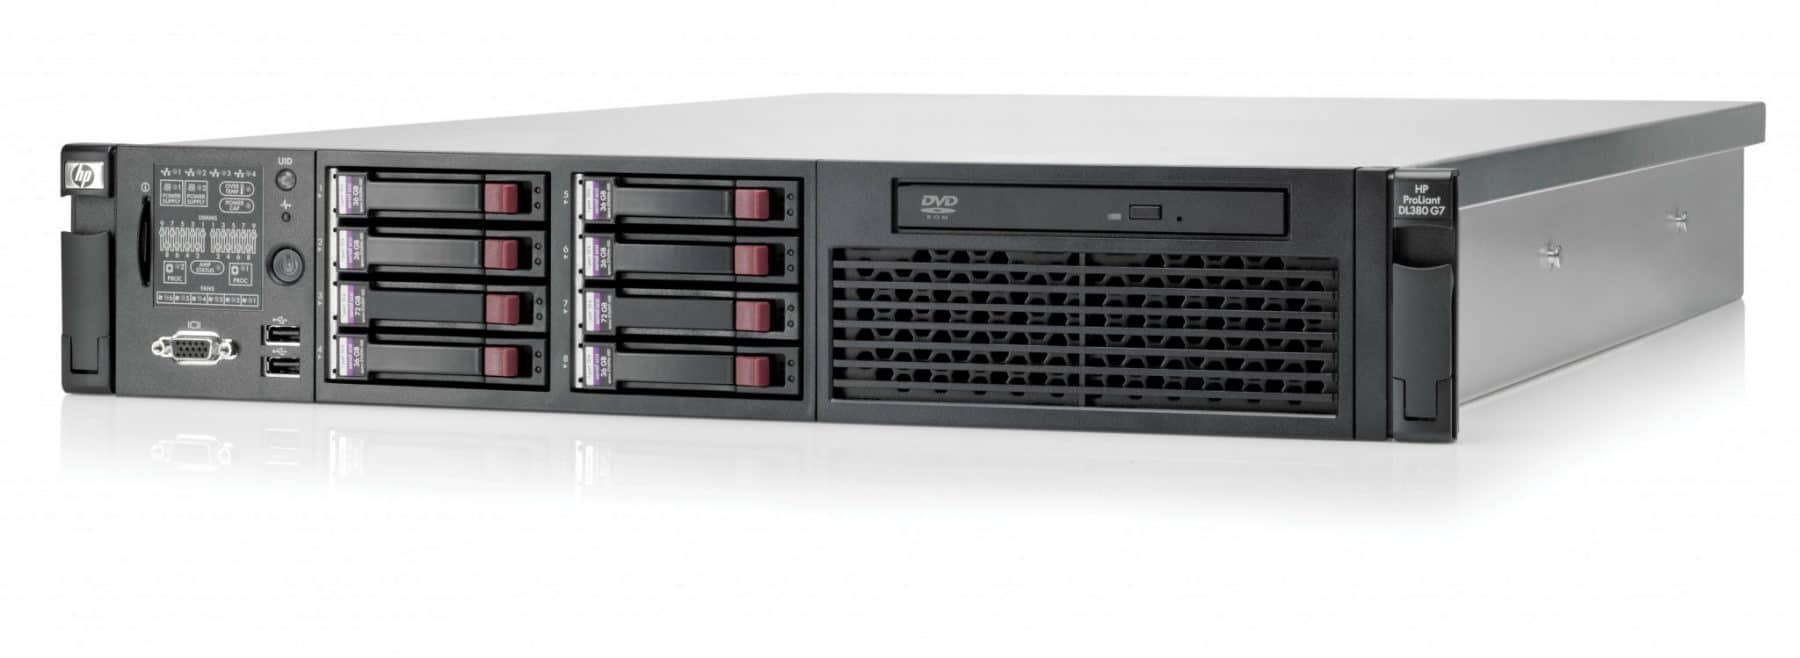 HP-Proliant-DL380-G7-Server-Front-View-1-8-1-2-2-3-1-3-1-1.jpe